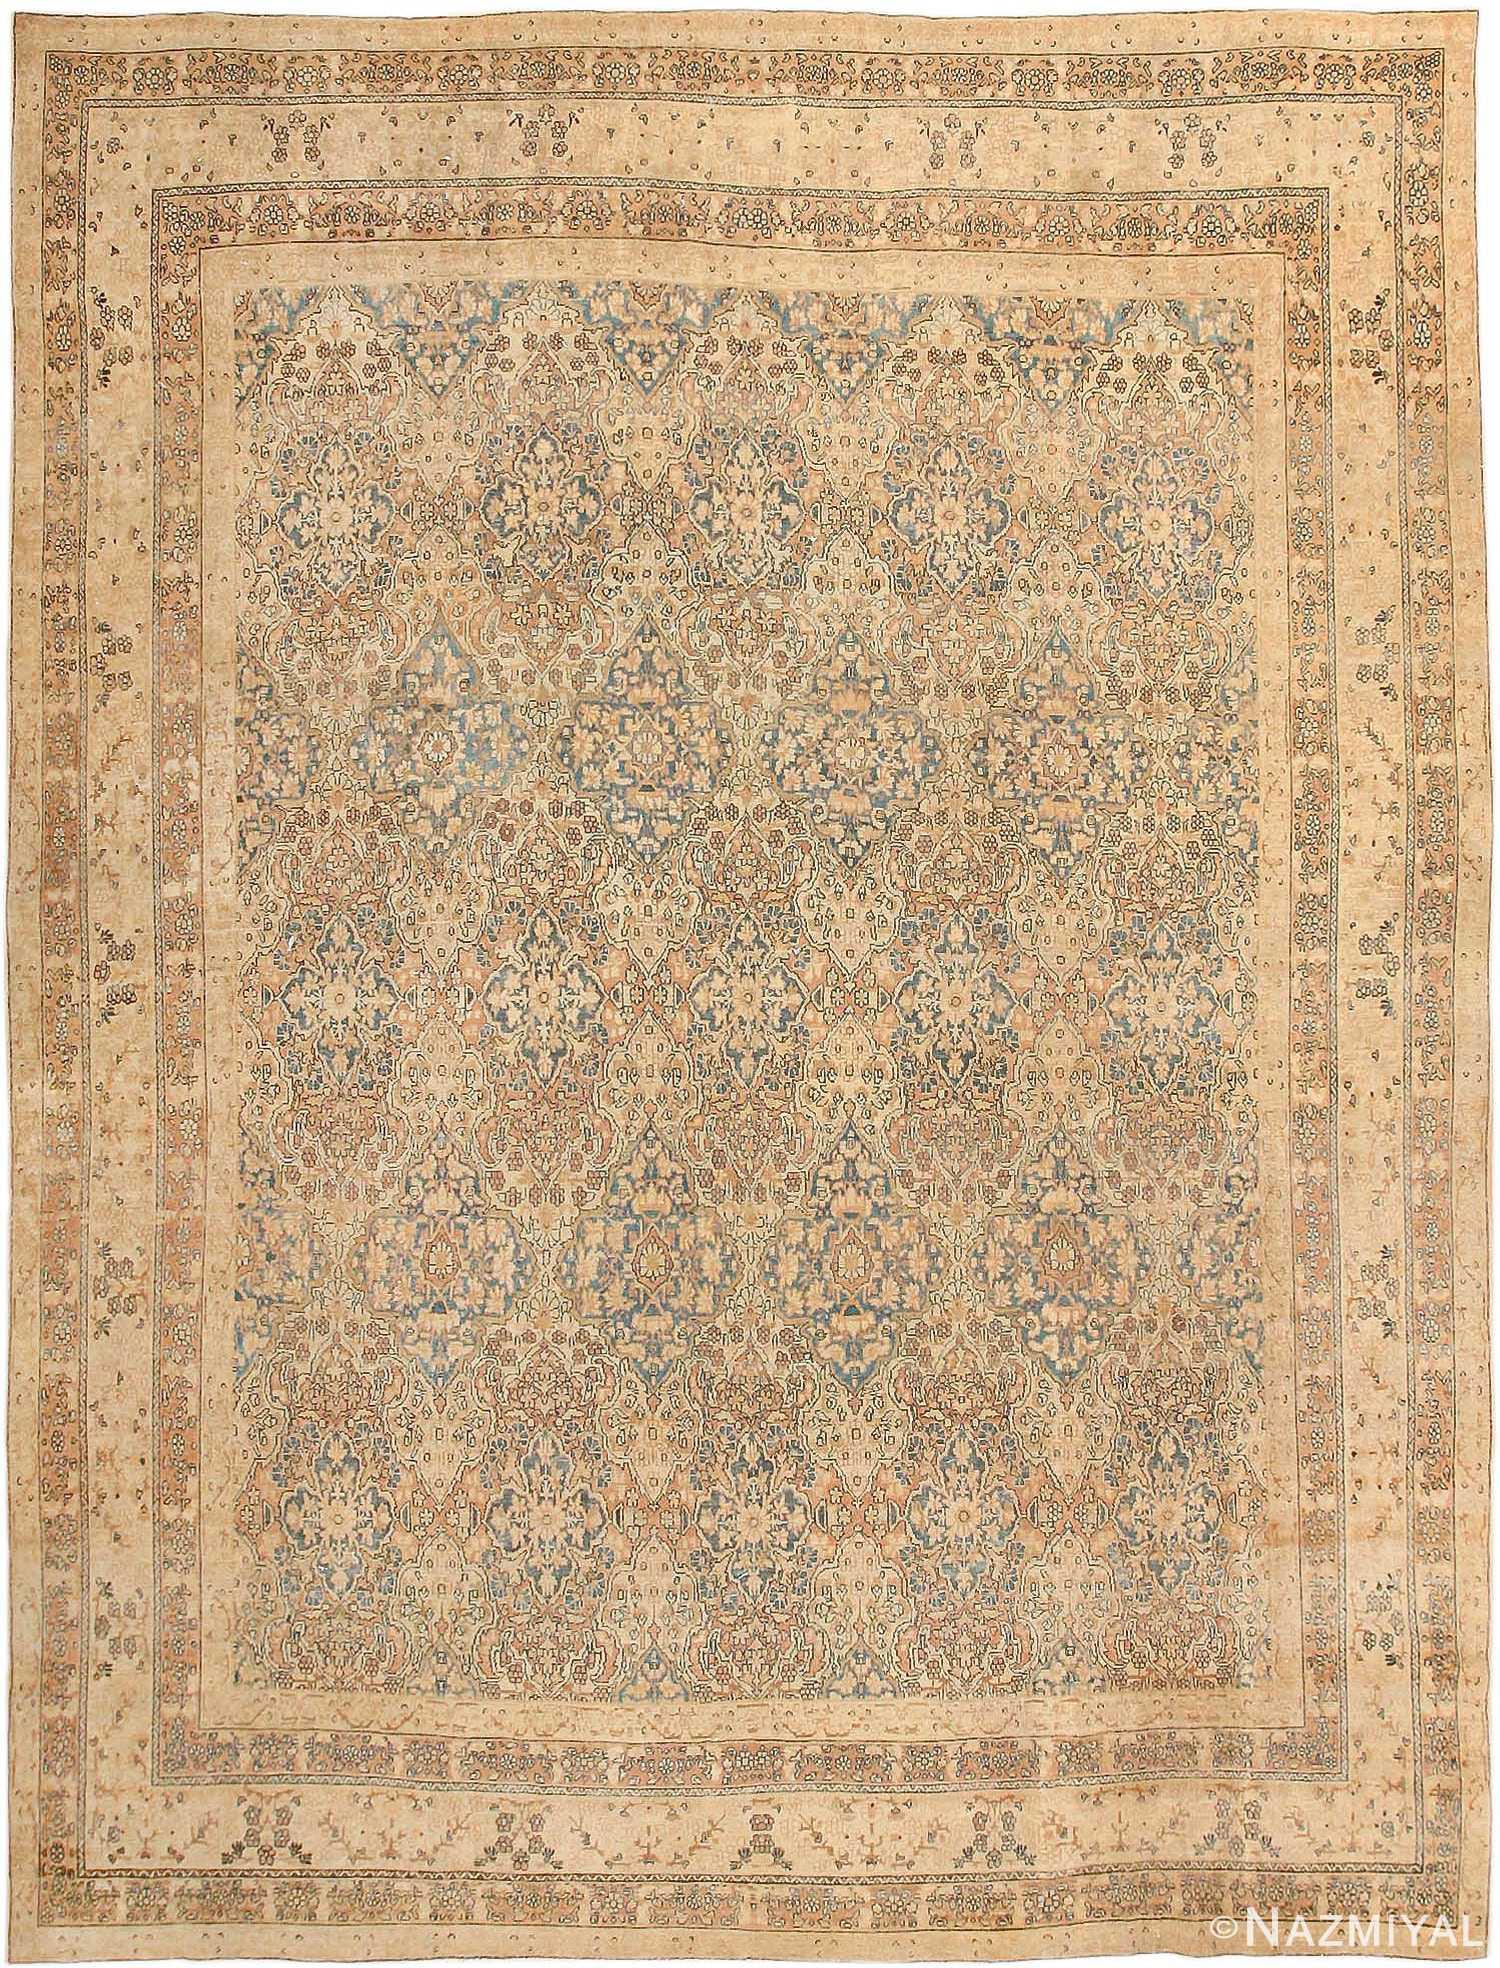 Decorative Fine Antique Room Size Persian Kerman Rug 42486 Nazmiyal